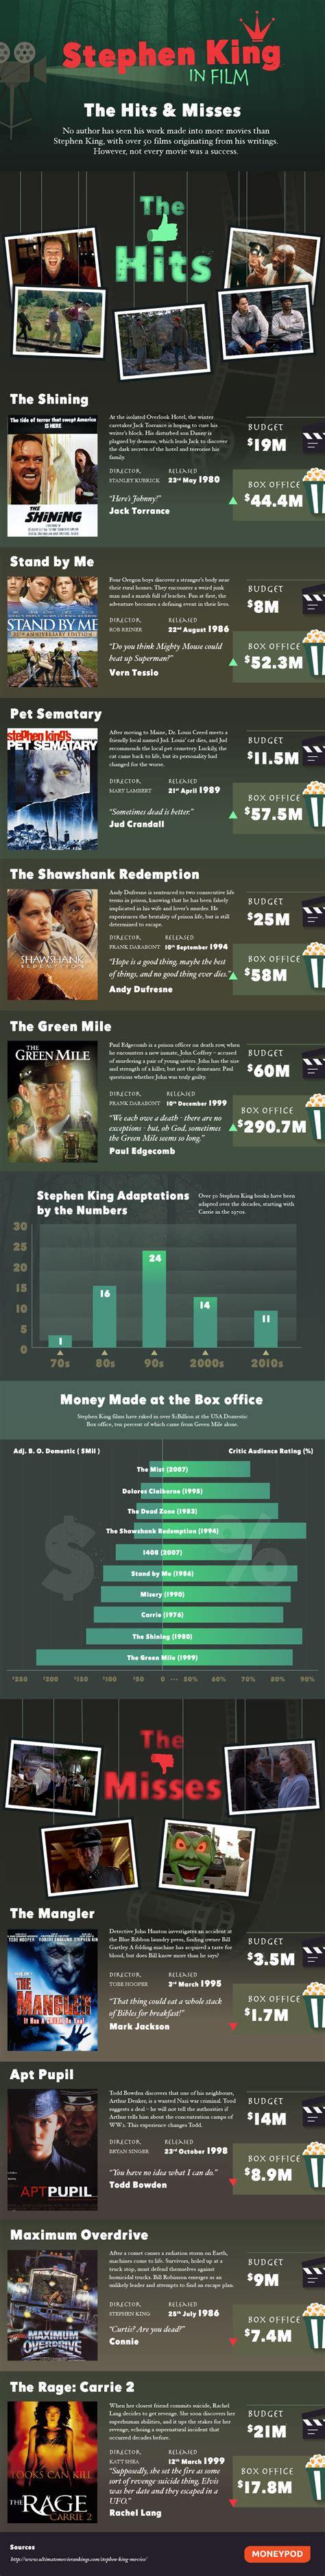 film it by stephen king stephen king in film moneypod